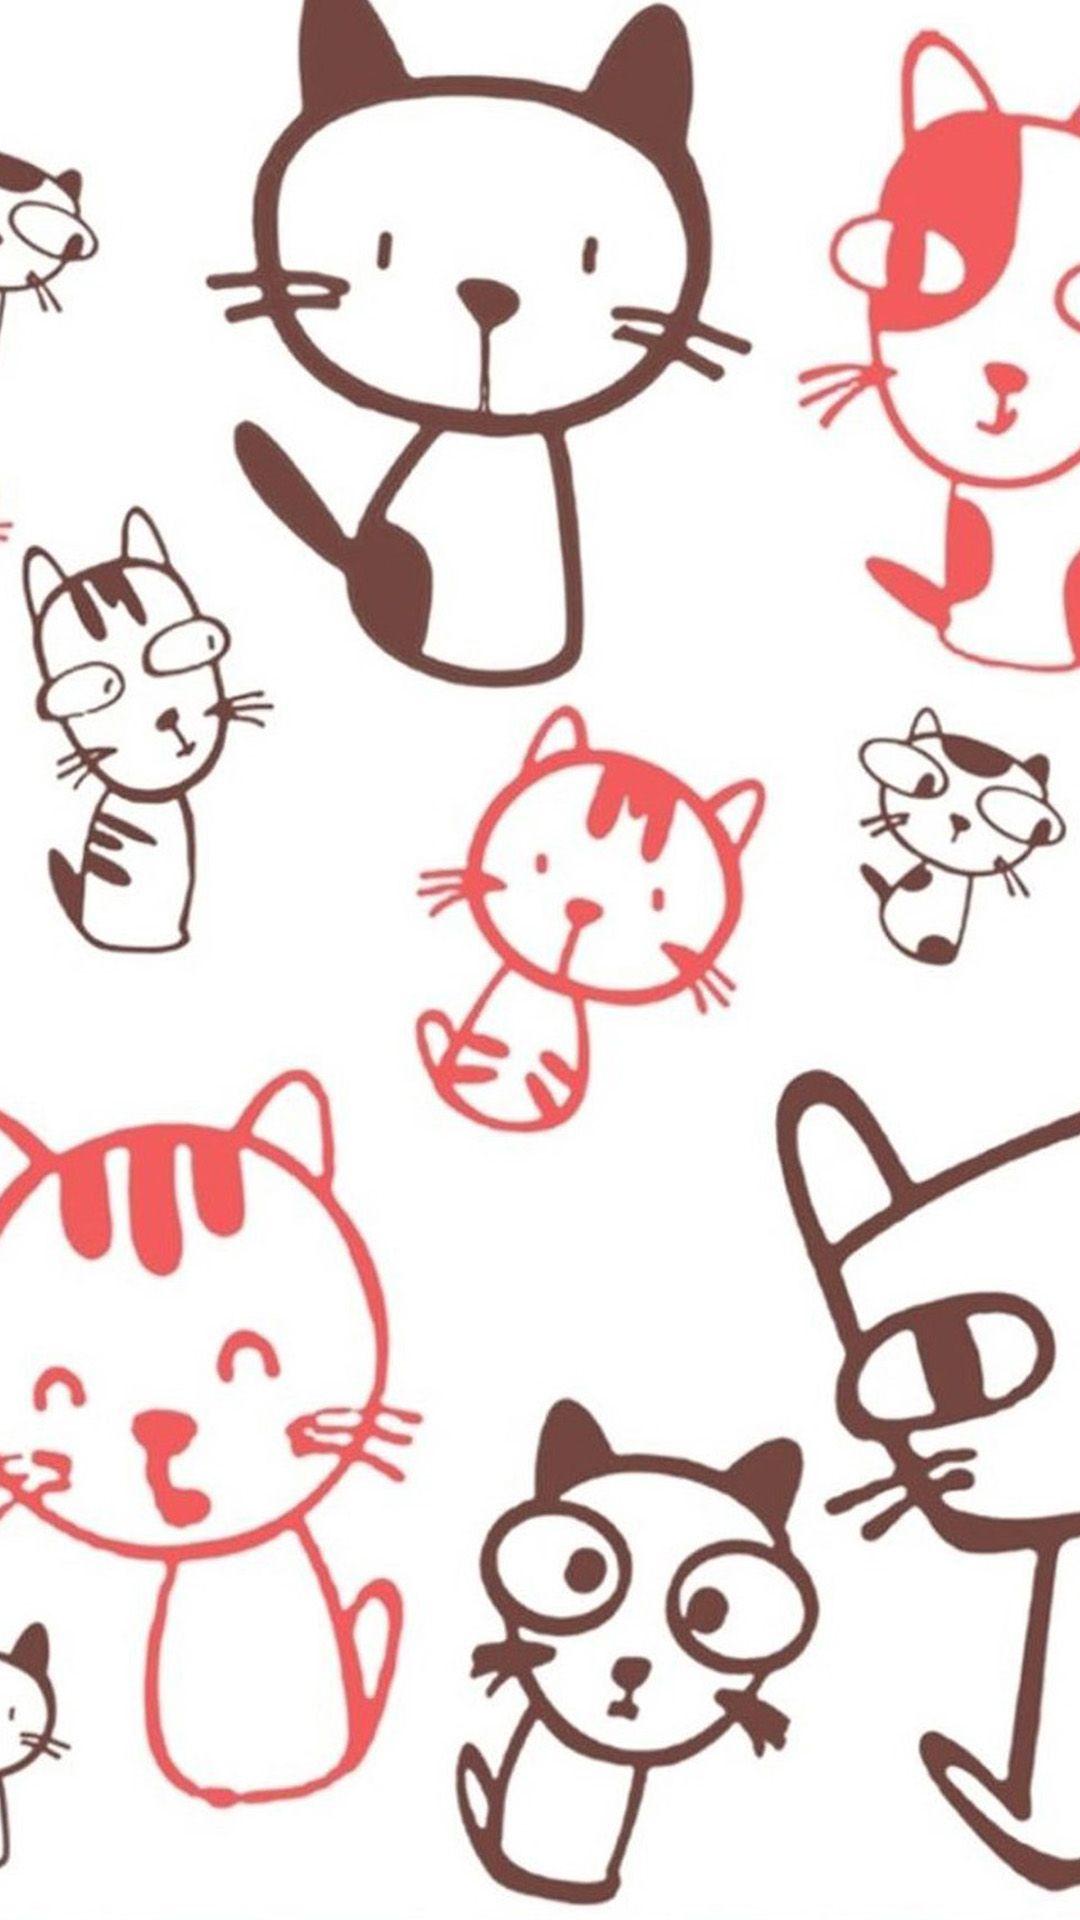 Cute wallpapers iphone buscar con google wallpapers pinterest cute wallpapers iphone buscar con google voltagebd Choice Image